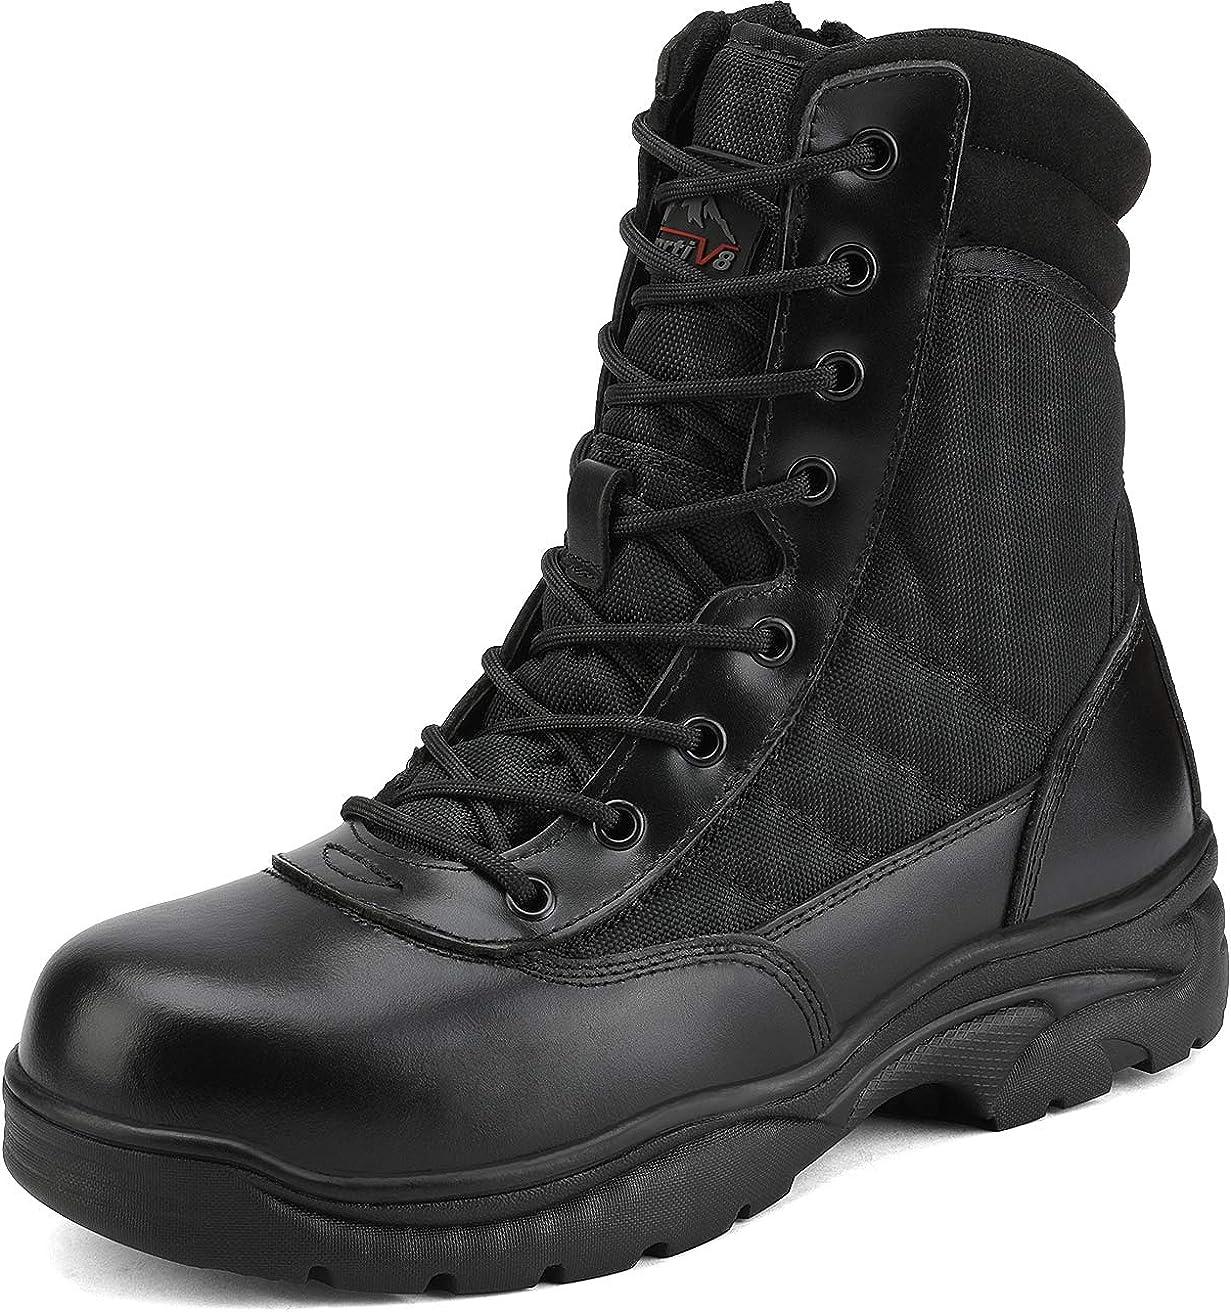 NORTIV 8 Men's Safety Steel Industrial Work Large discharge sale Indefinitely Anti-Slip Boots Toe